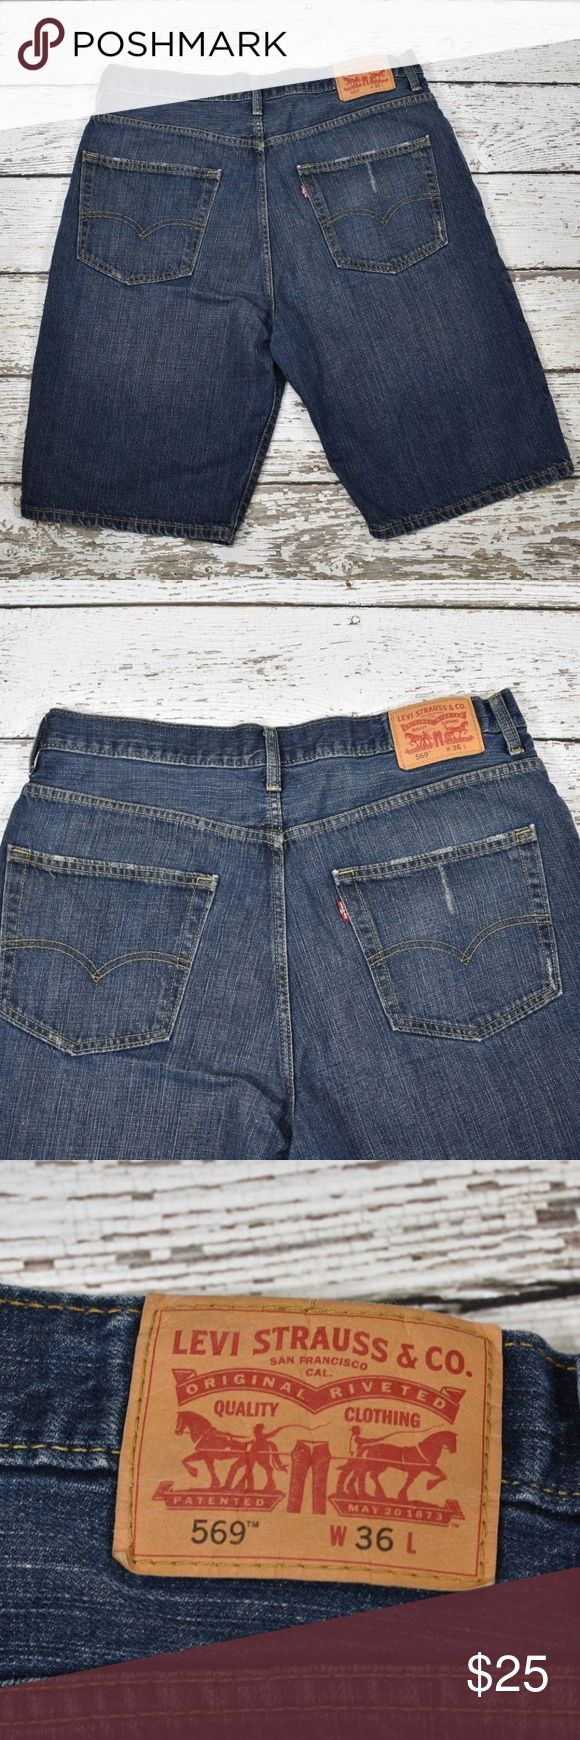 "Levi 569 Men's Denim Shorts Men's Levi 569 denim shorts Size 36 normal wash/wear  measurements laying flat: waist 19"" total length 26"" Levi's Shorts Jean Shorts"